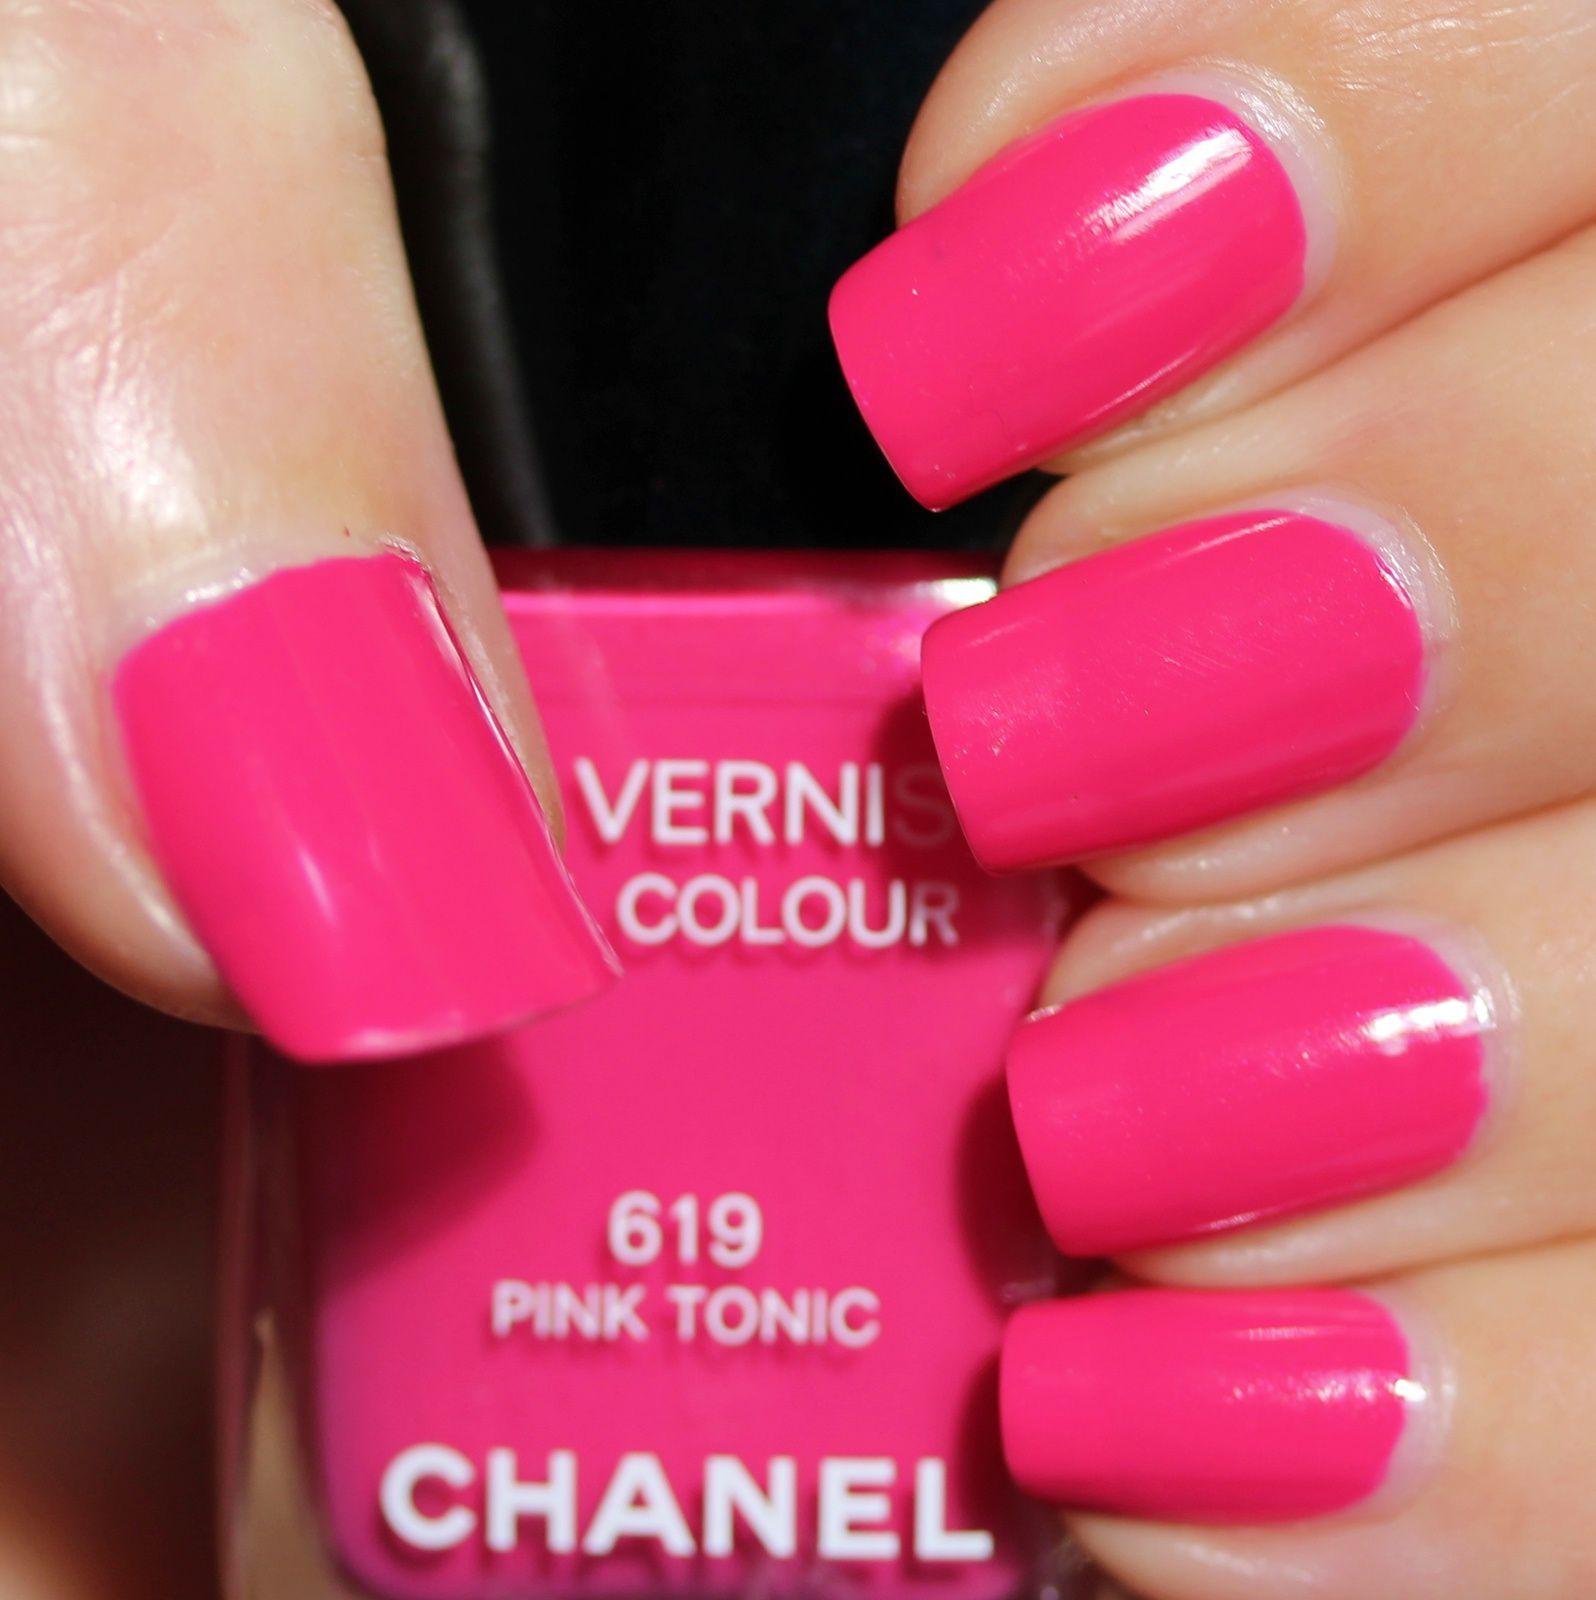 Chanel Pink Tonic